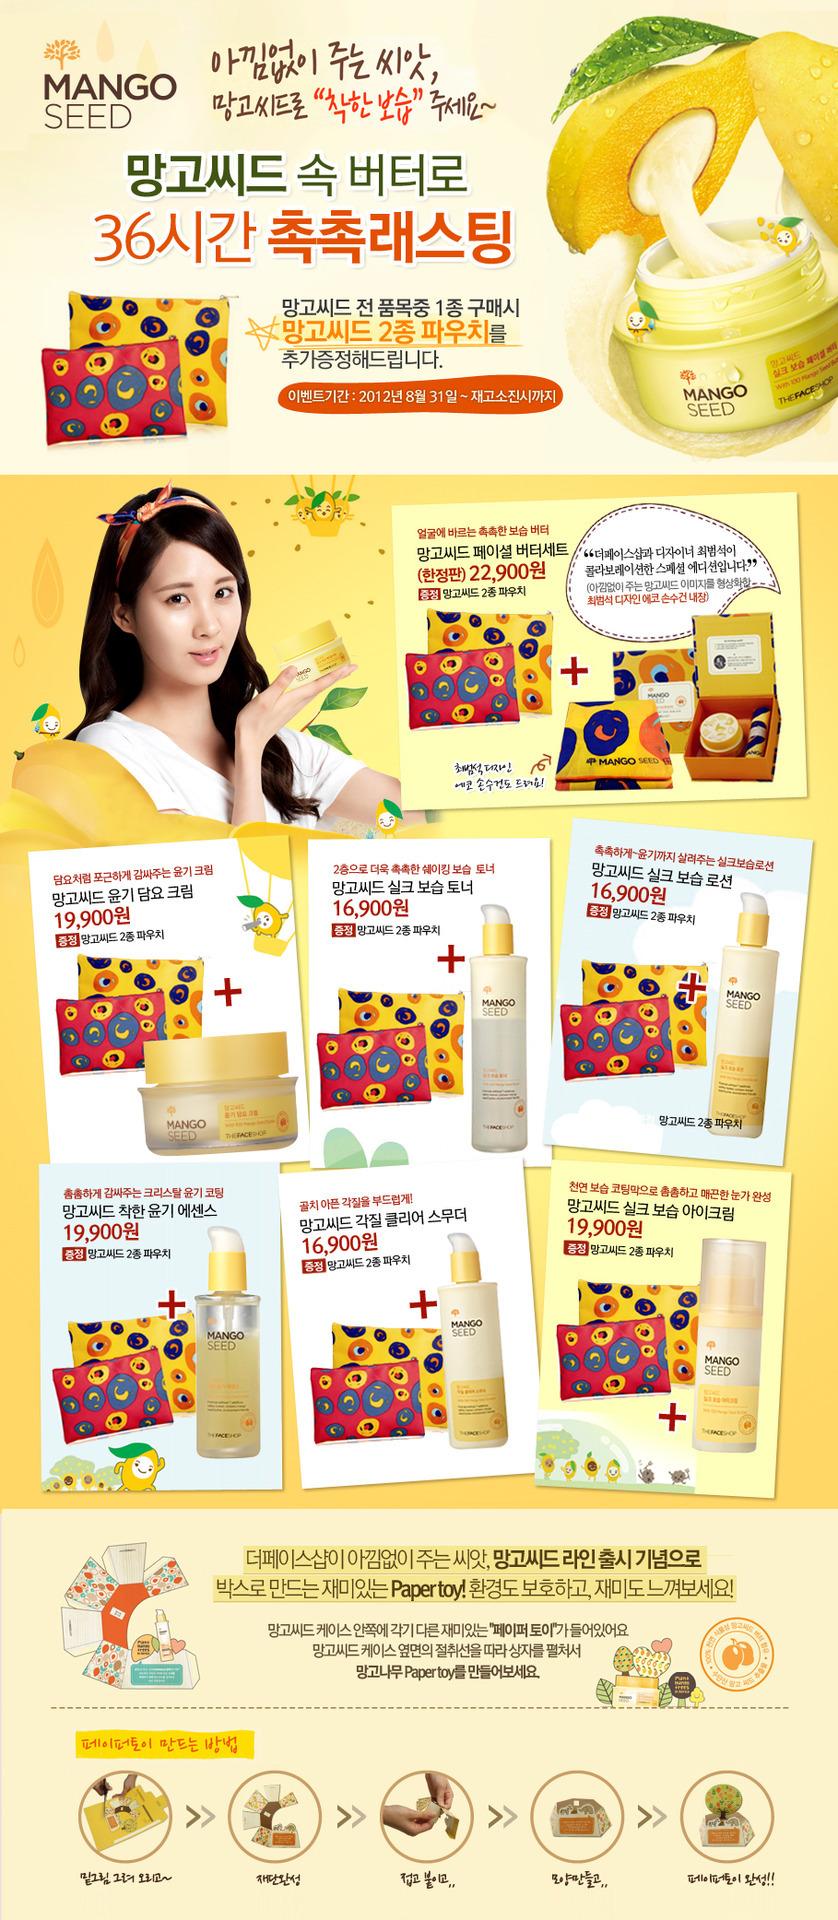 [PICS] Seohyun - The Face Shop Promotion Picture HD ♥ - Página 2 Tumblr_m9tgzvAFwa1qiknqko1_1280